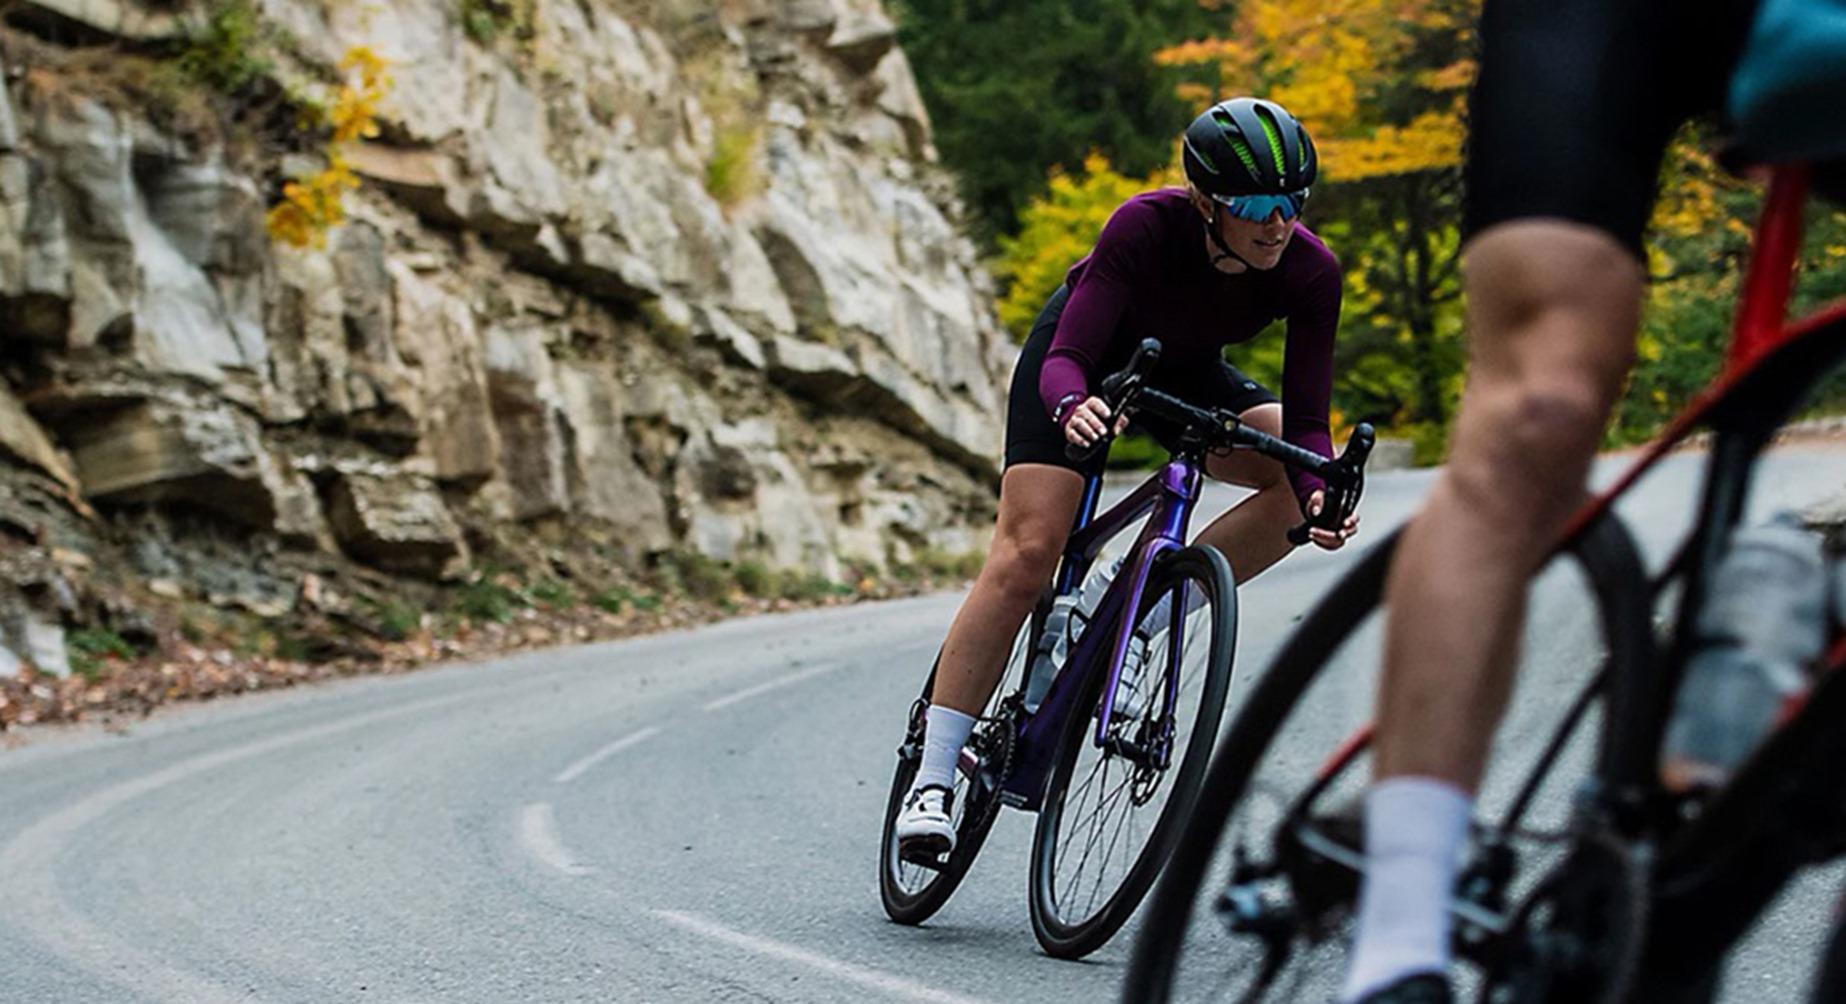 Cylce scheme road bikes